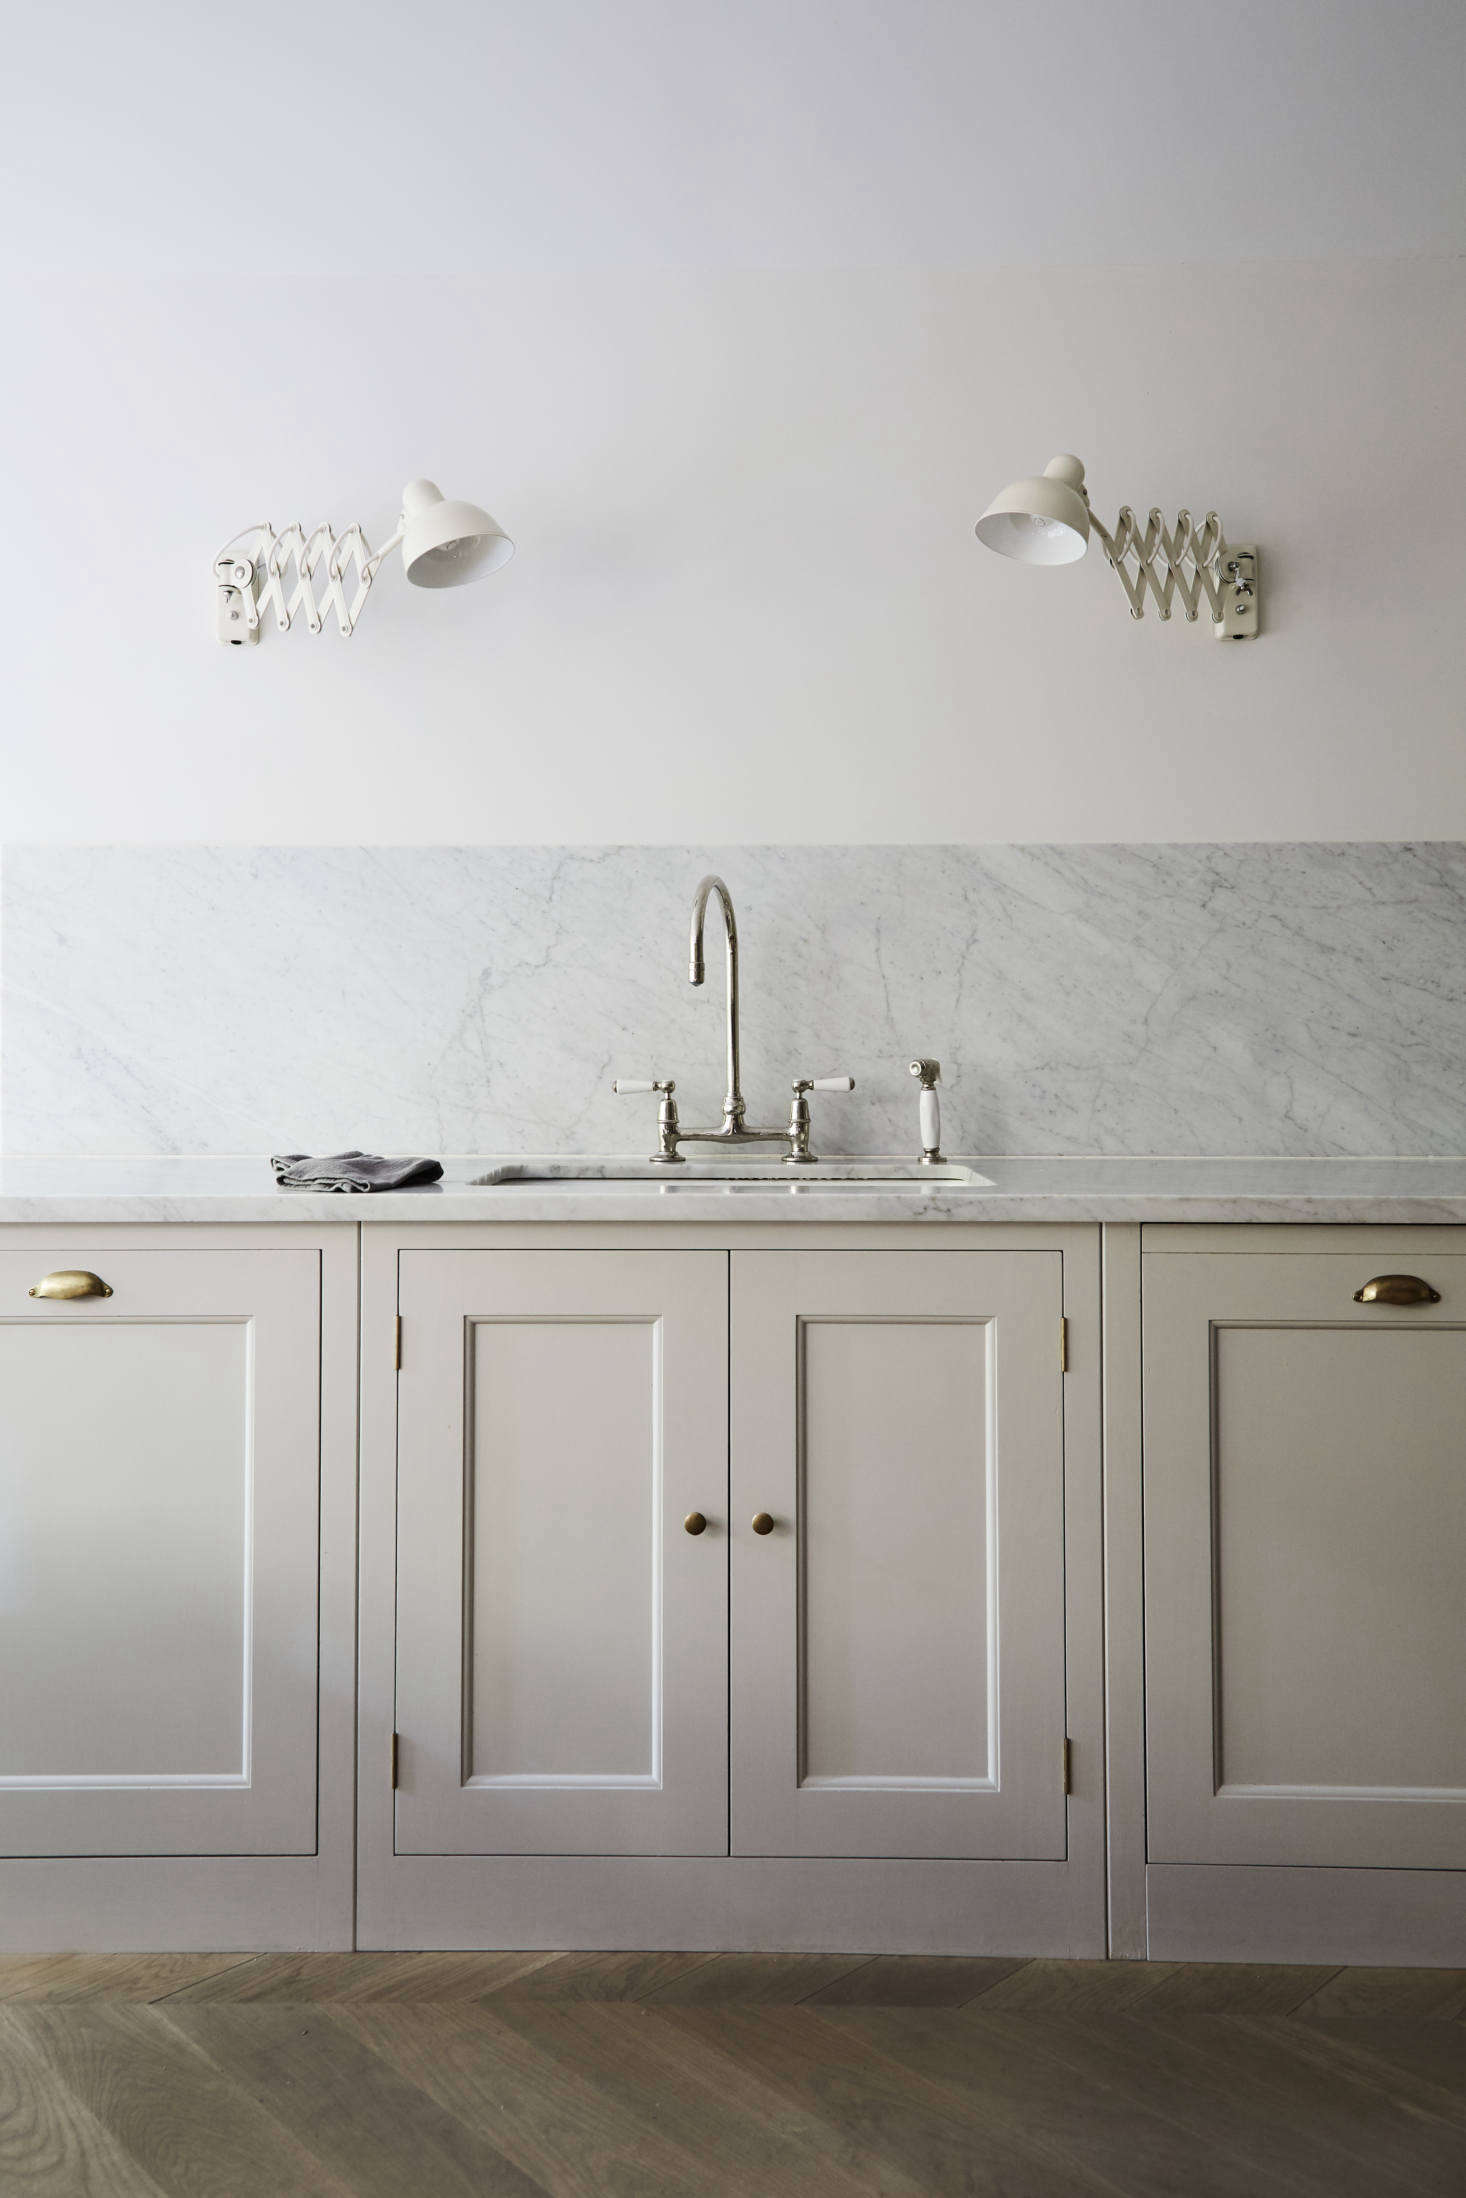 - 16 Favorite Solid Marble Kitchen Backsplashes, For Maximum Drama